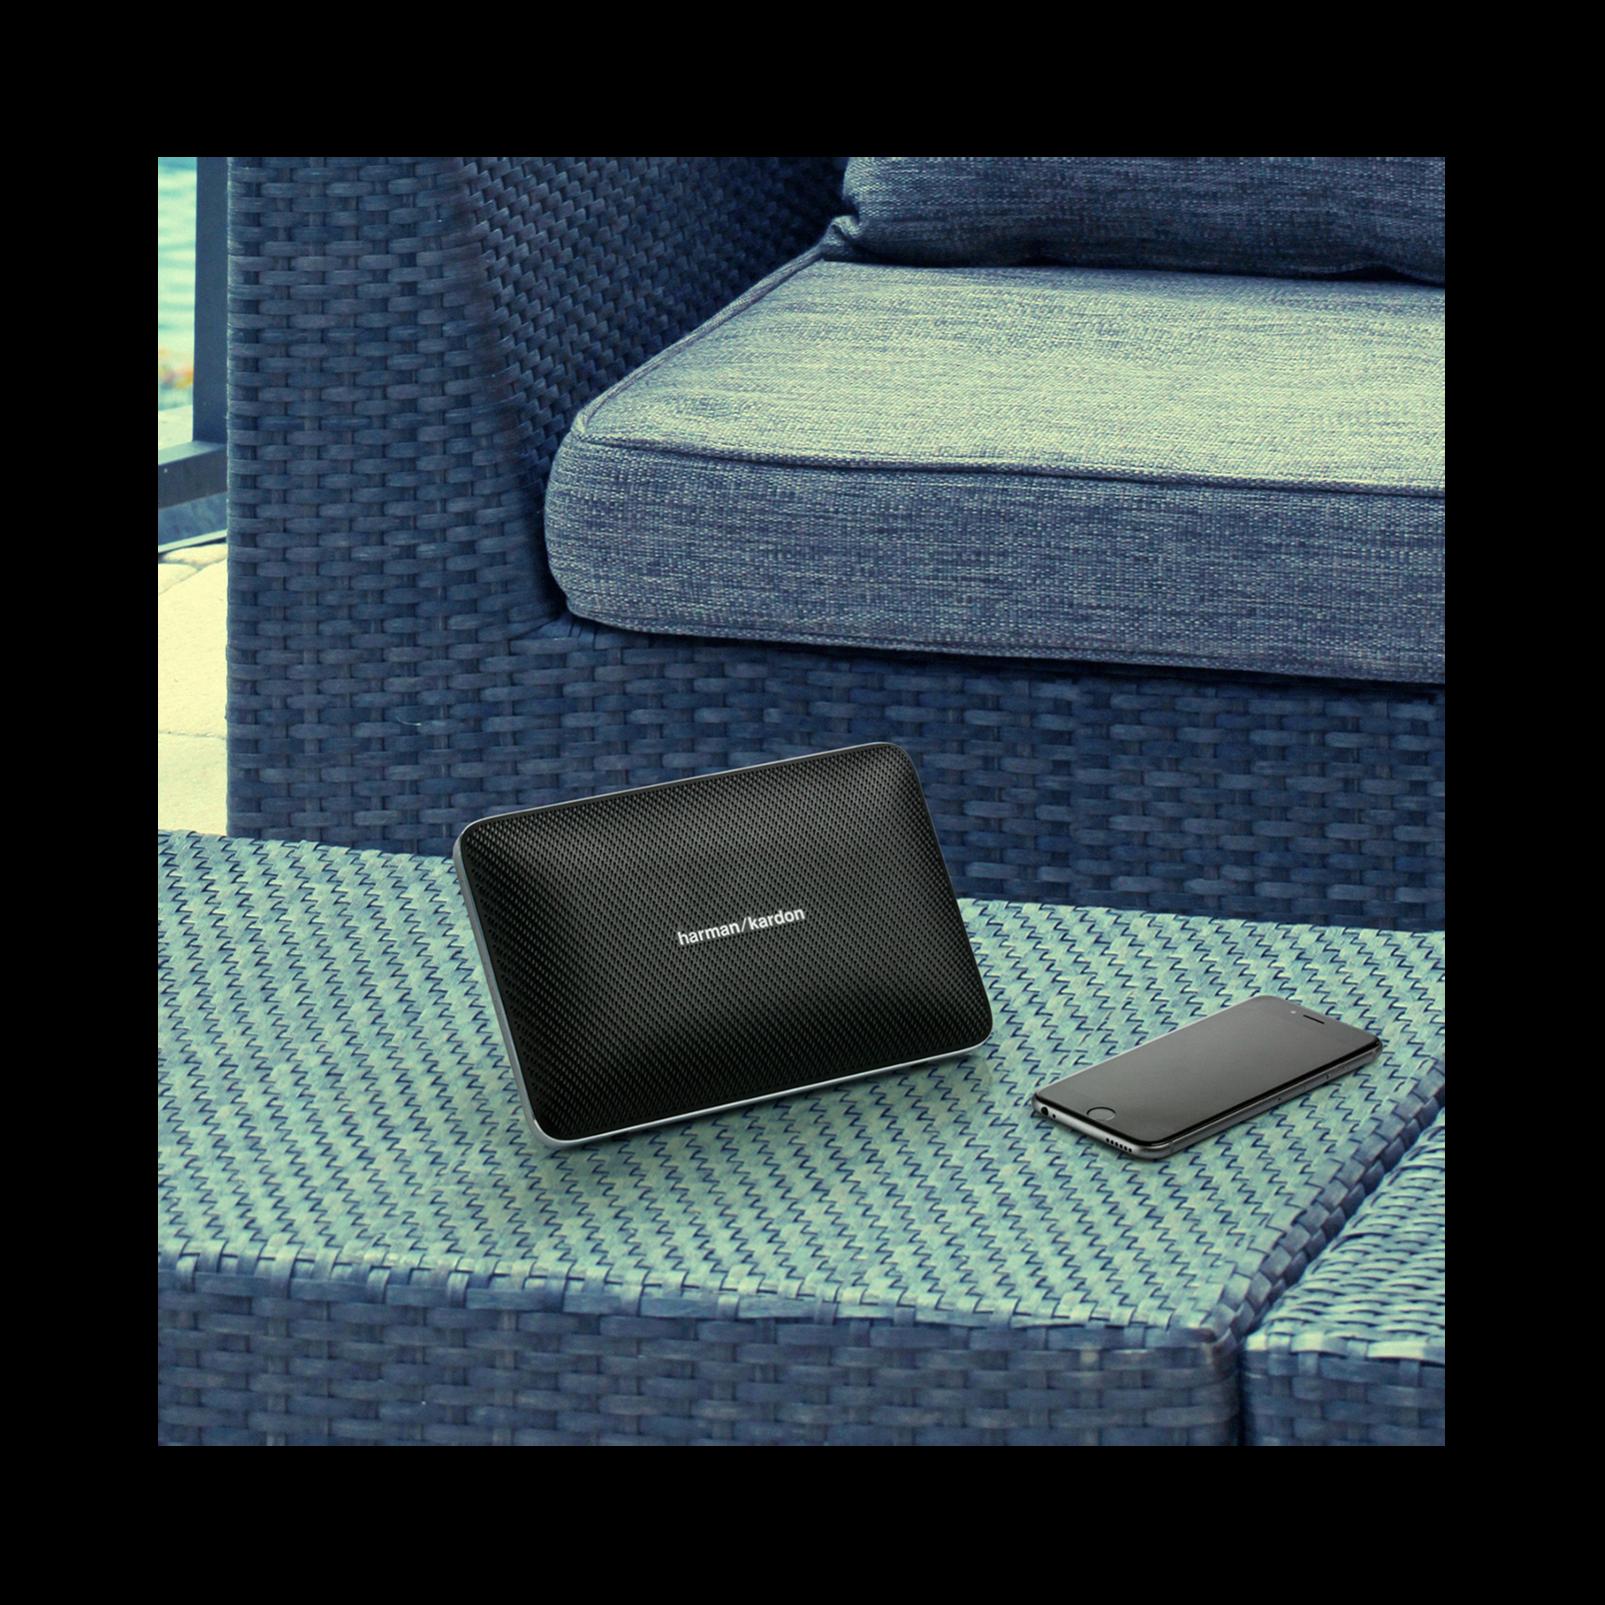 Esquire 2 - Black - Premium portable Bluetooth speaker with quad microphone conferencing system - Detailshot 8